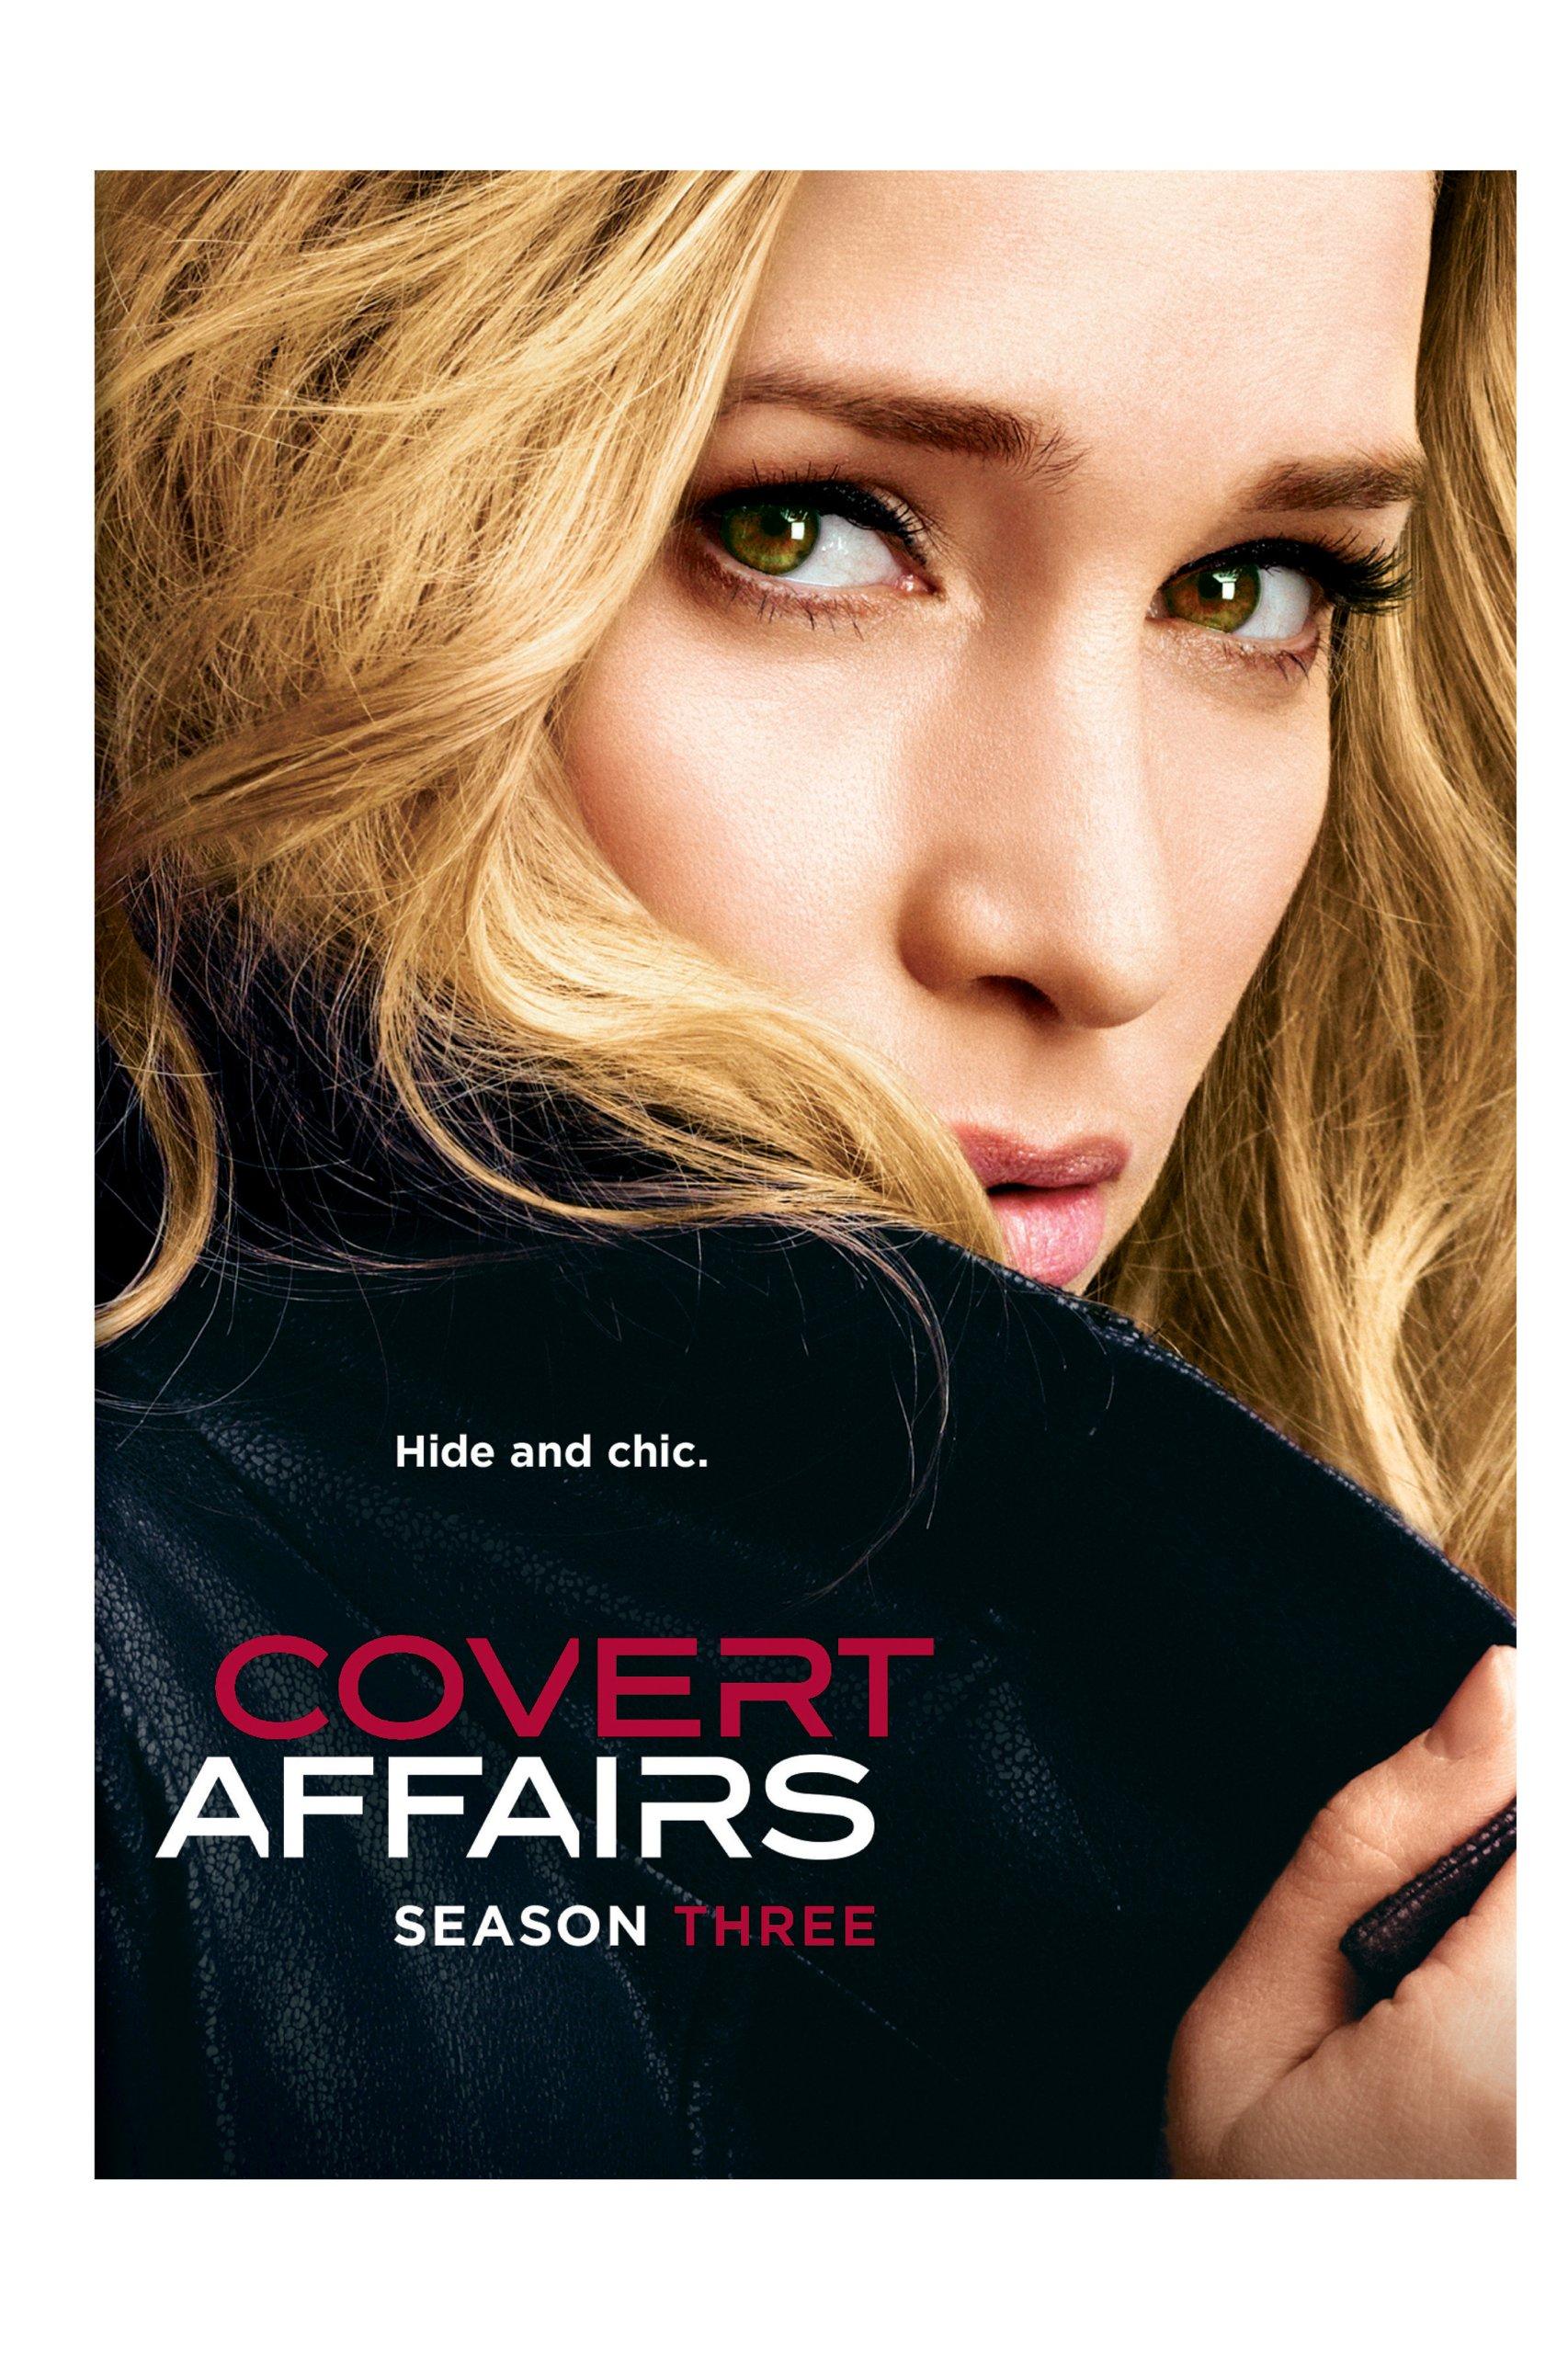 DVD : Covert Affairs: Season Three (Boxed Set, Snap Case, Slipsleeve Packaging, 4 Disc)